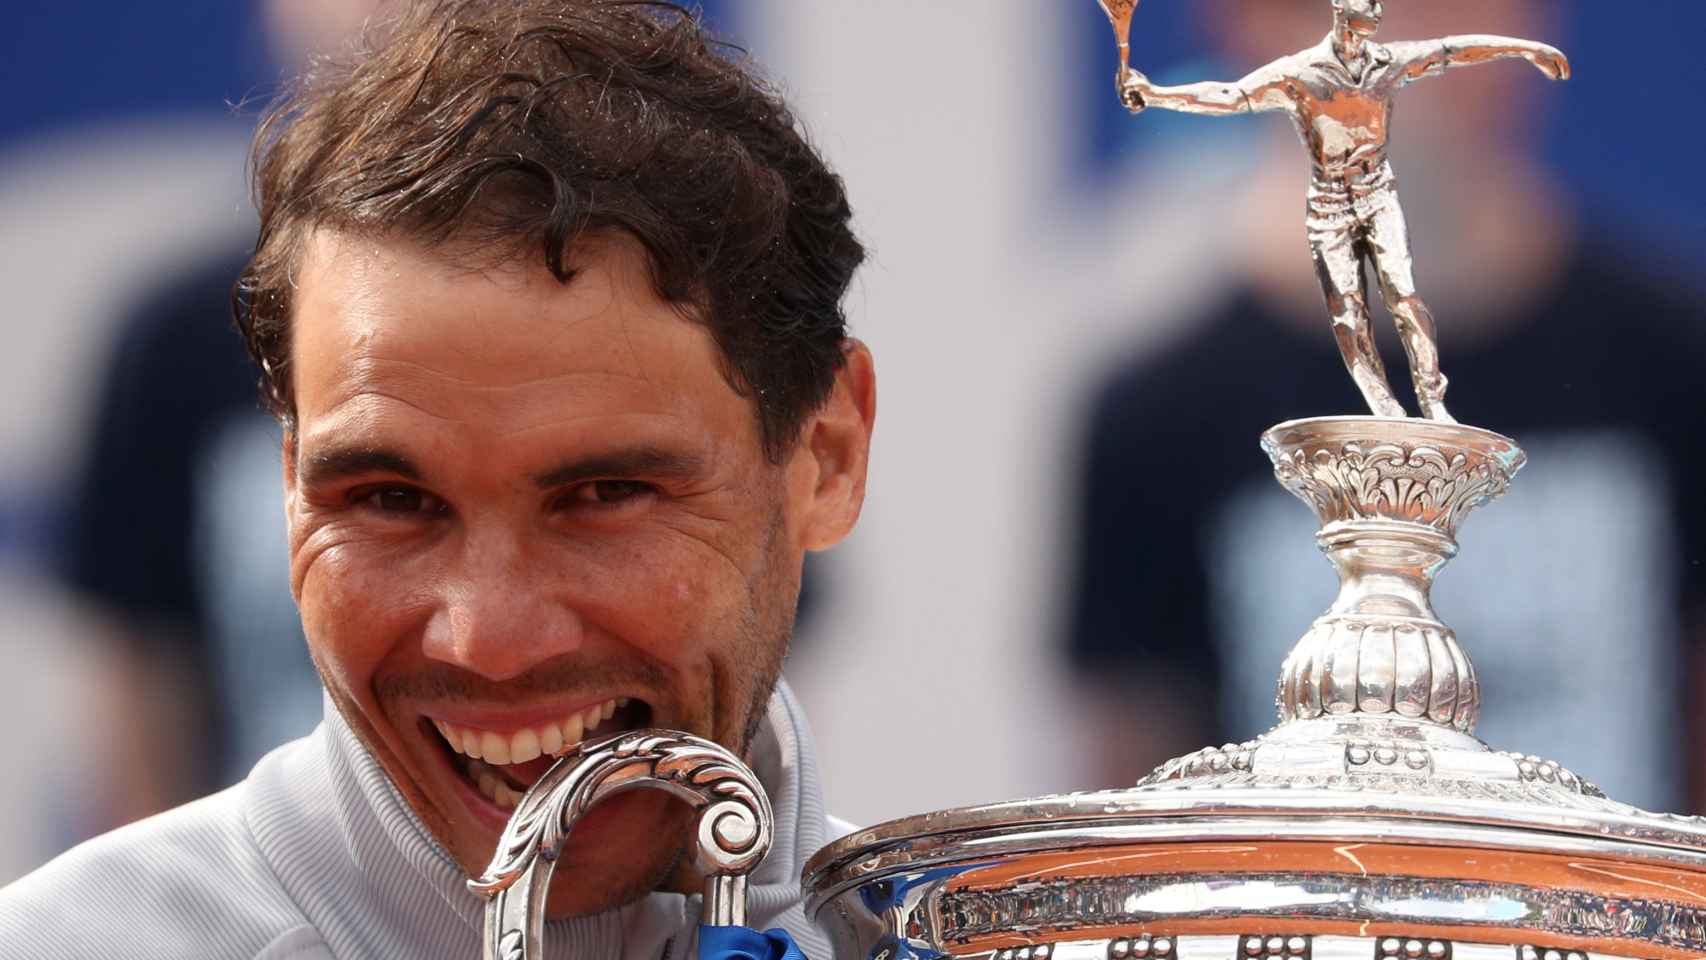 Rafa Nadal mordió por undécima vez el trofeo del Conde de Godó. / Reuters